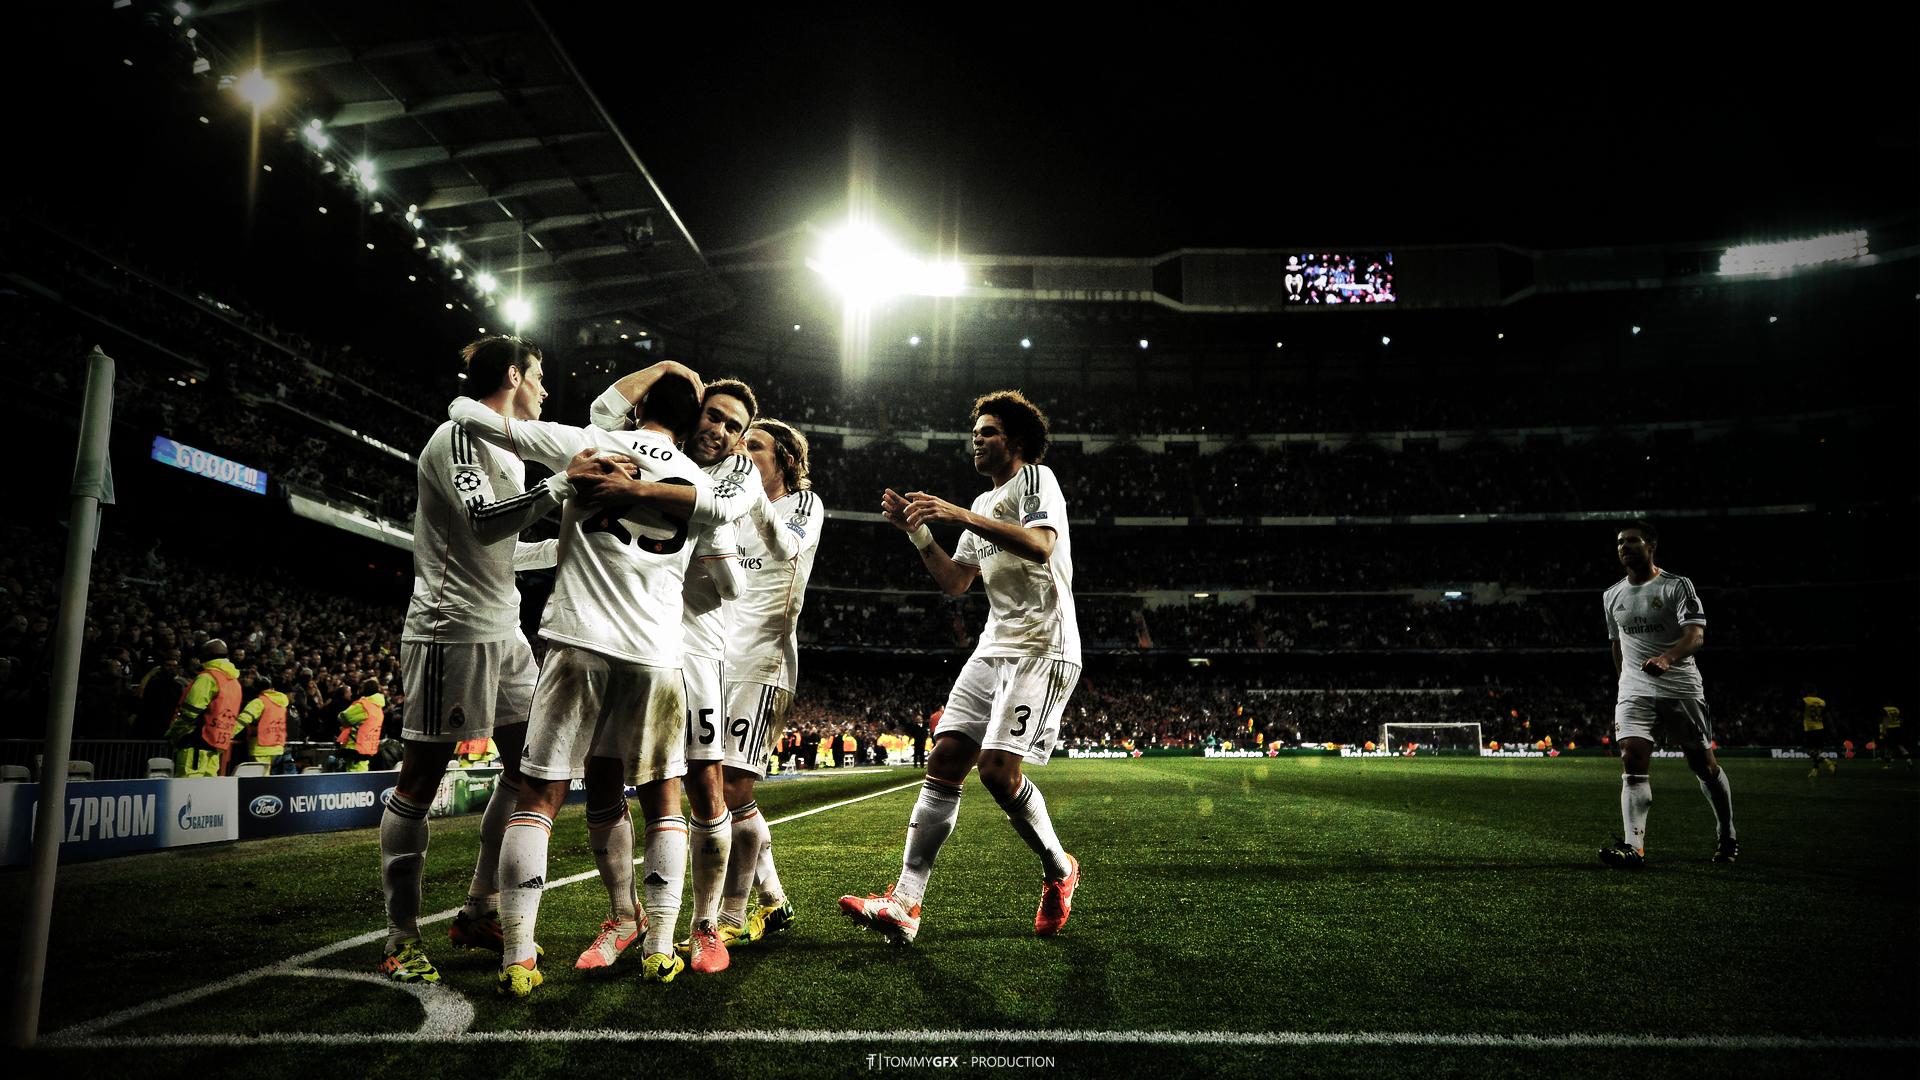 Real Madrid Wallpaper Desktop Backgrounds Free Madrid Wallpaper Real Madrid Wallpapers Real Madrid Team